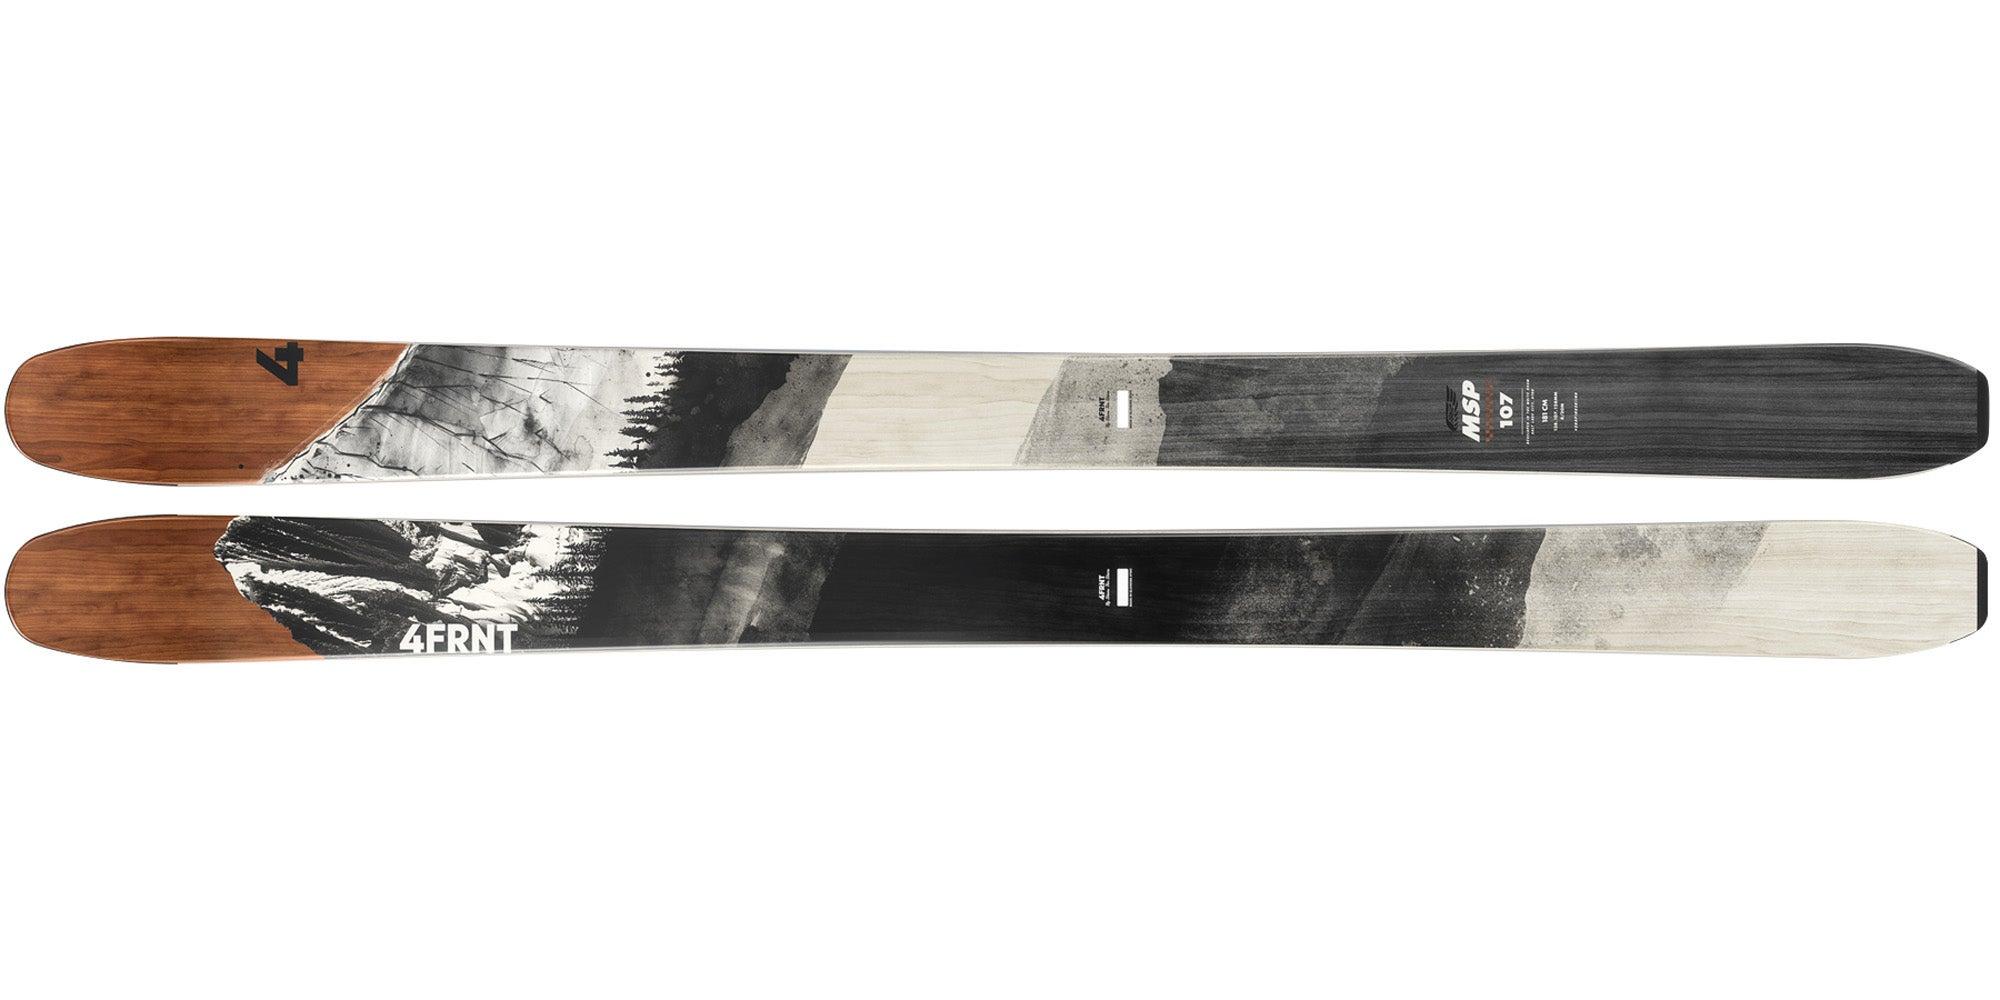 2021 4FRNT MSP 107 Men's All-Mountain Wide Ski